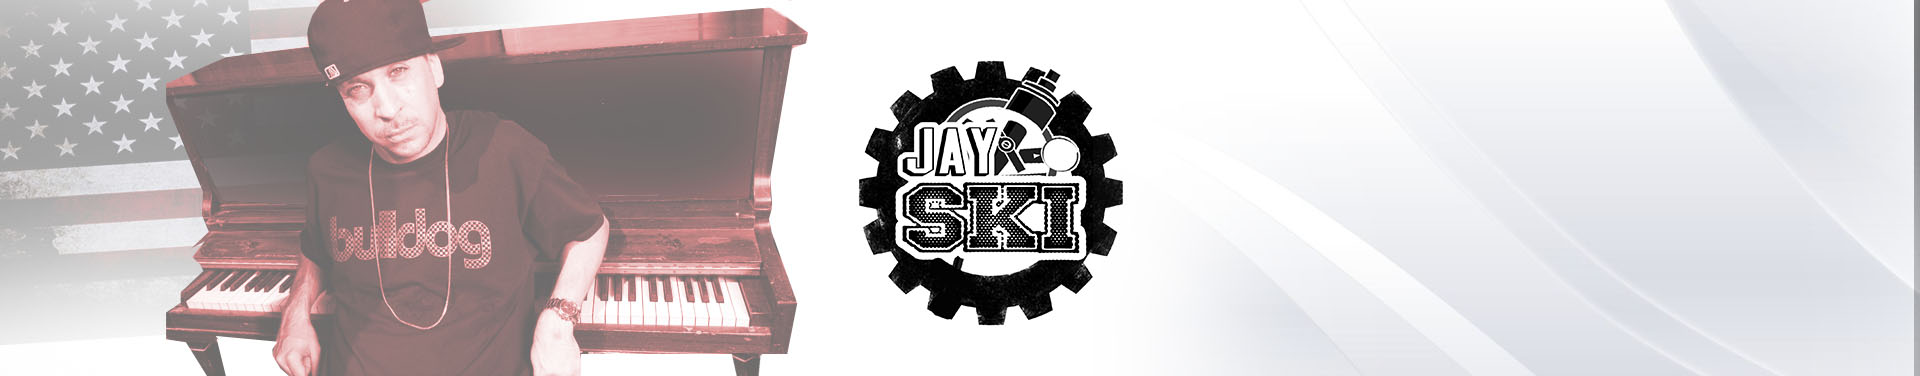 jay ski-djs-banner_dj